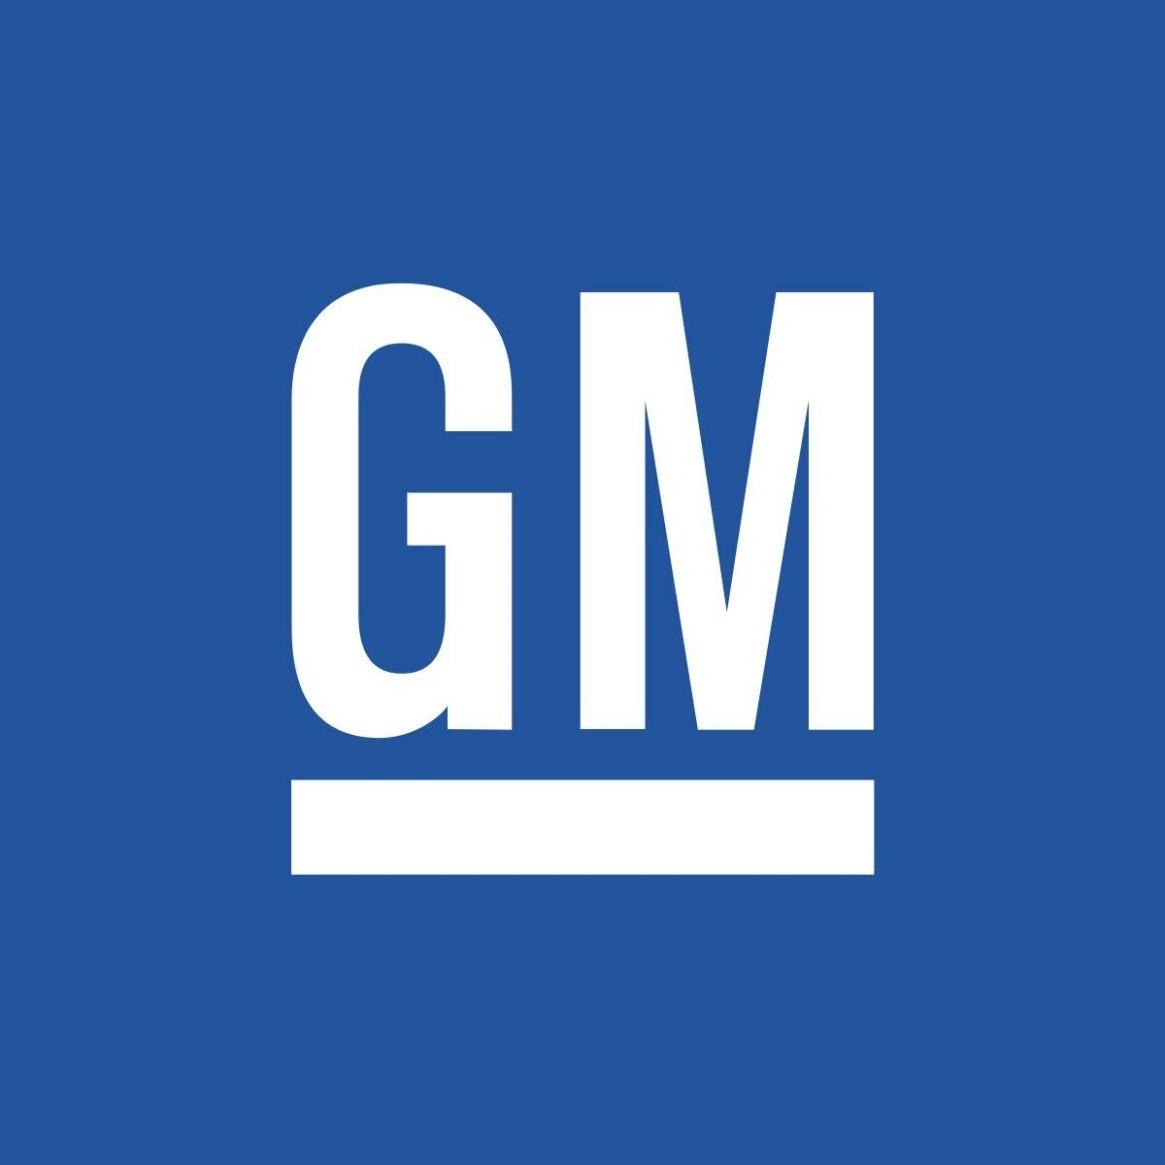 (Chevrolet, Buick, Cadillac, GMC, Holden, Baojun, Wuling Motors, Jiefang)